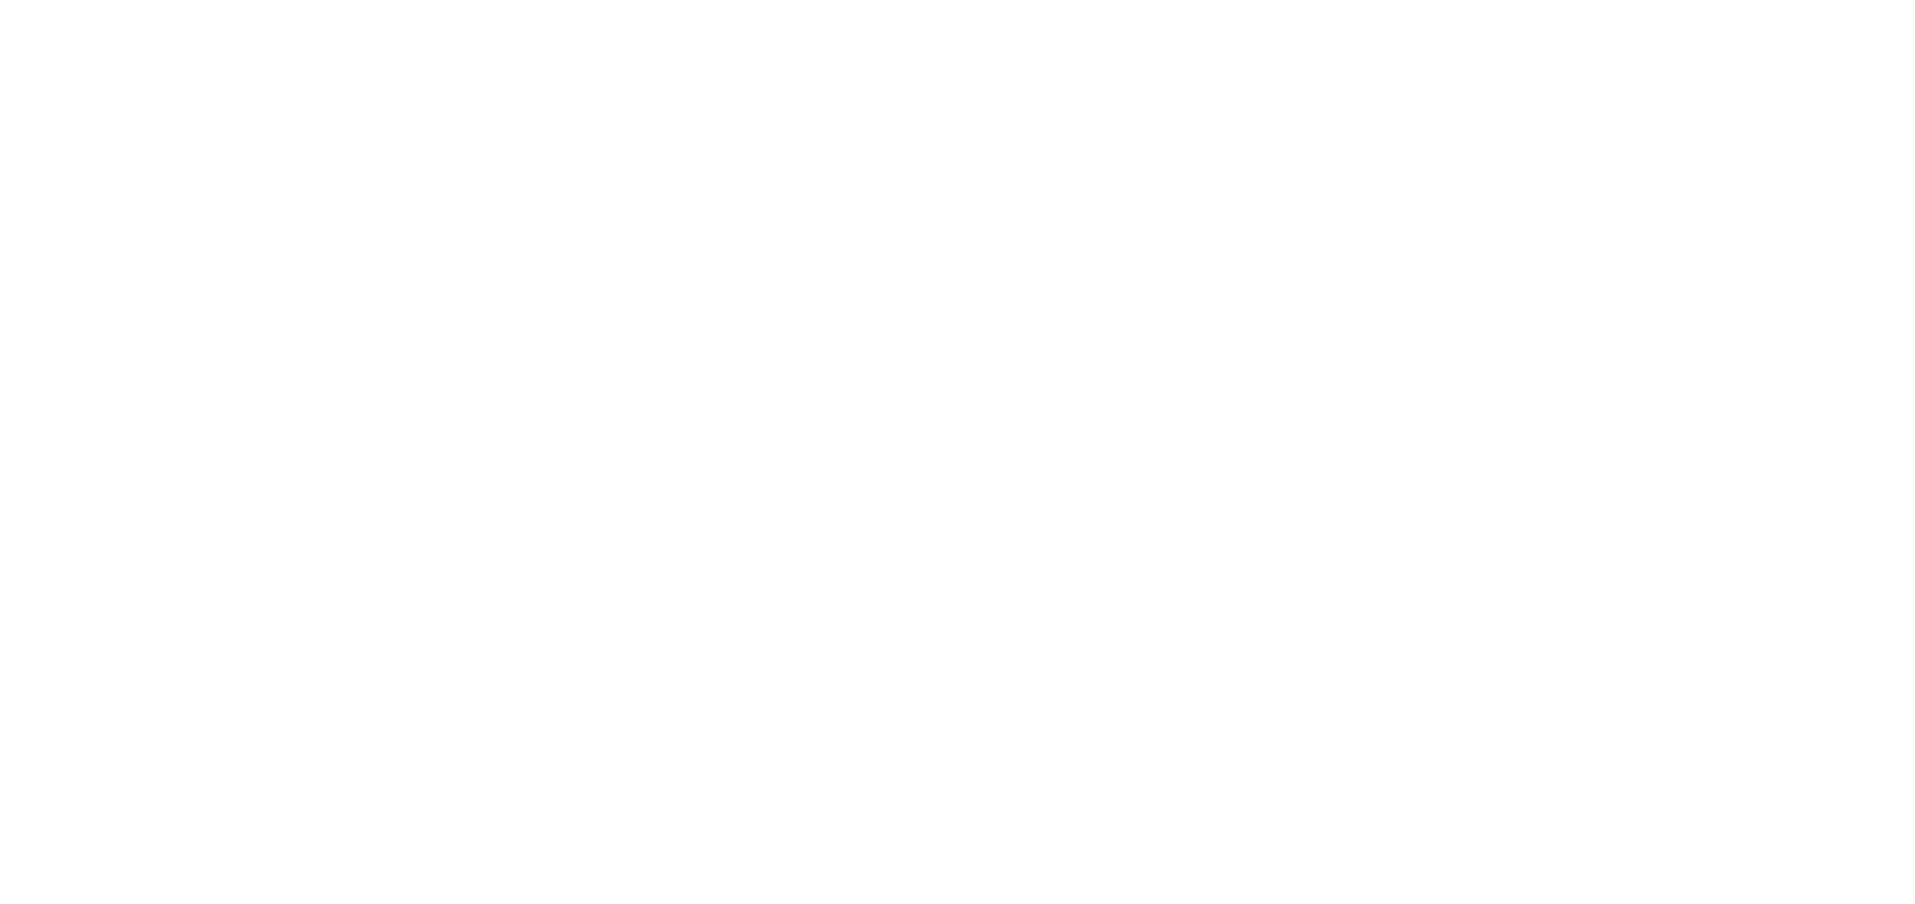 LOGO-WHITE-PNG